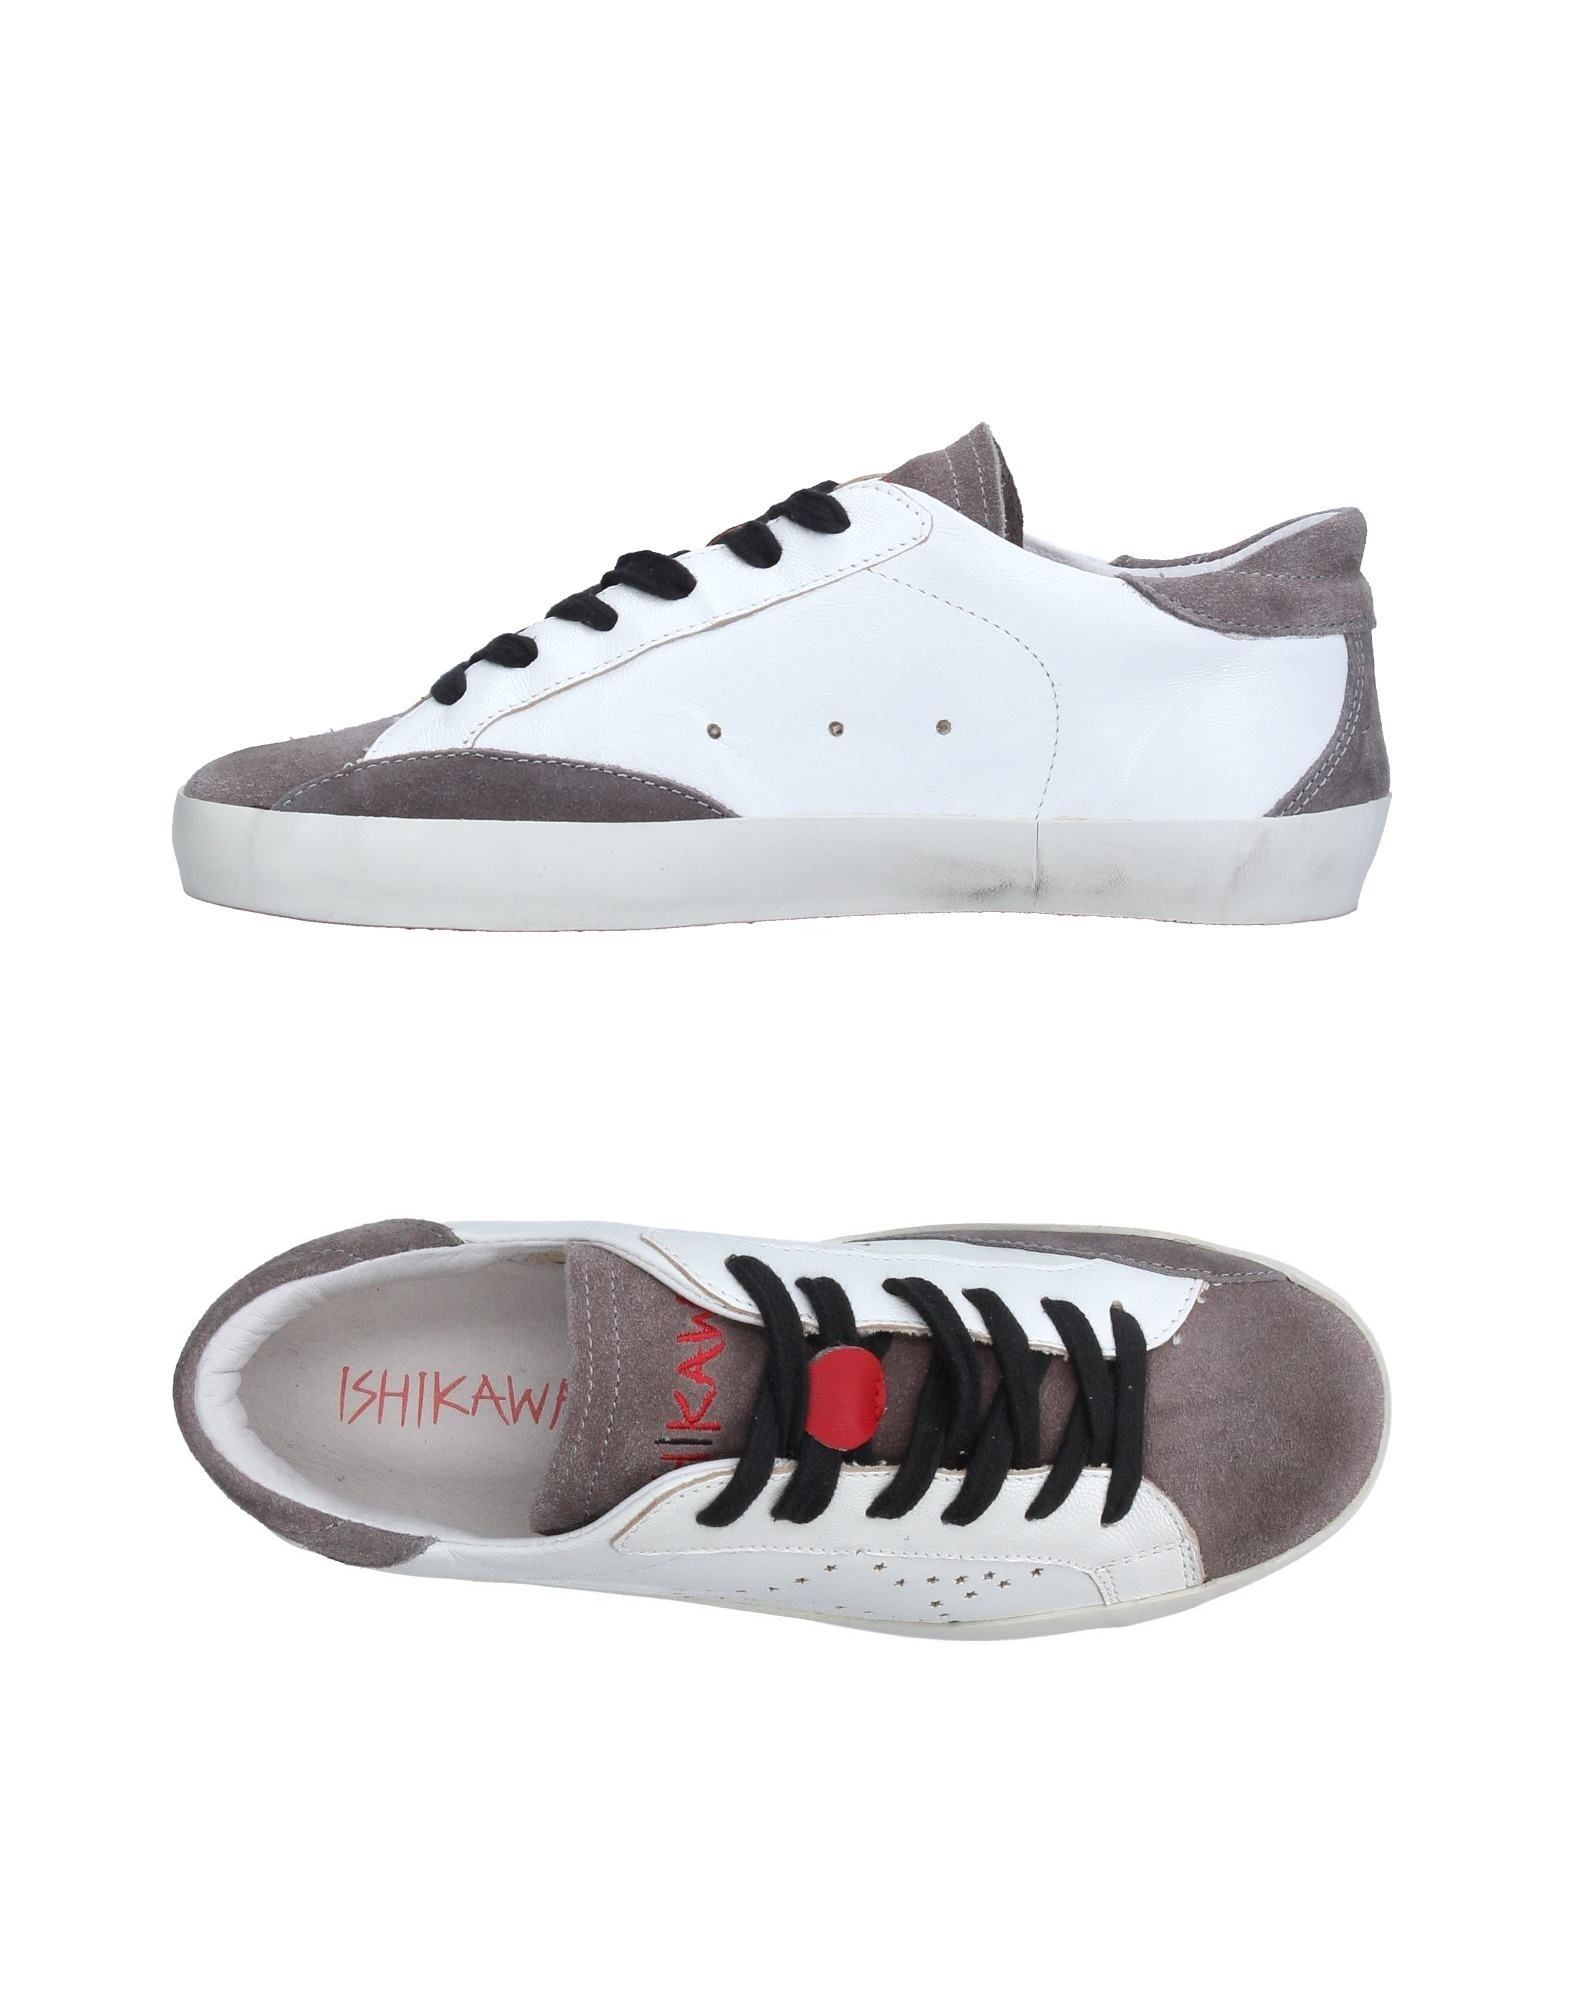 Sneakers Ishikawa Femme - Sneakers Ishikawa sur